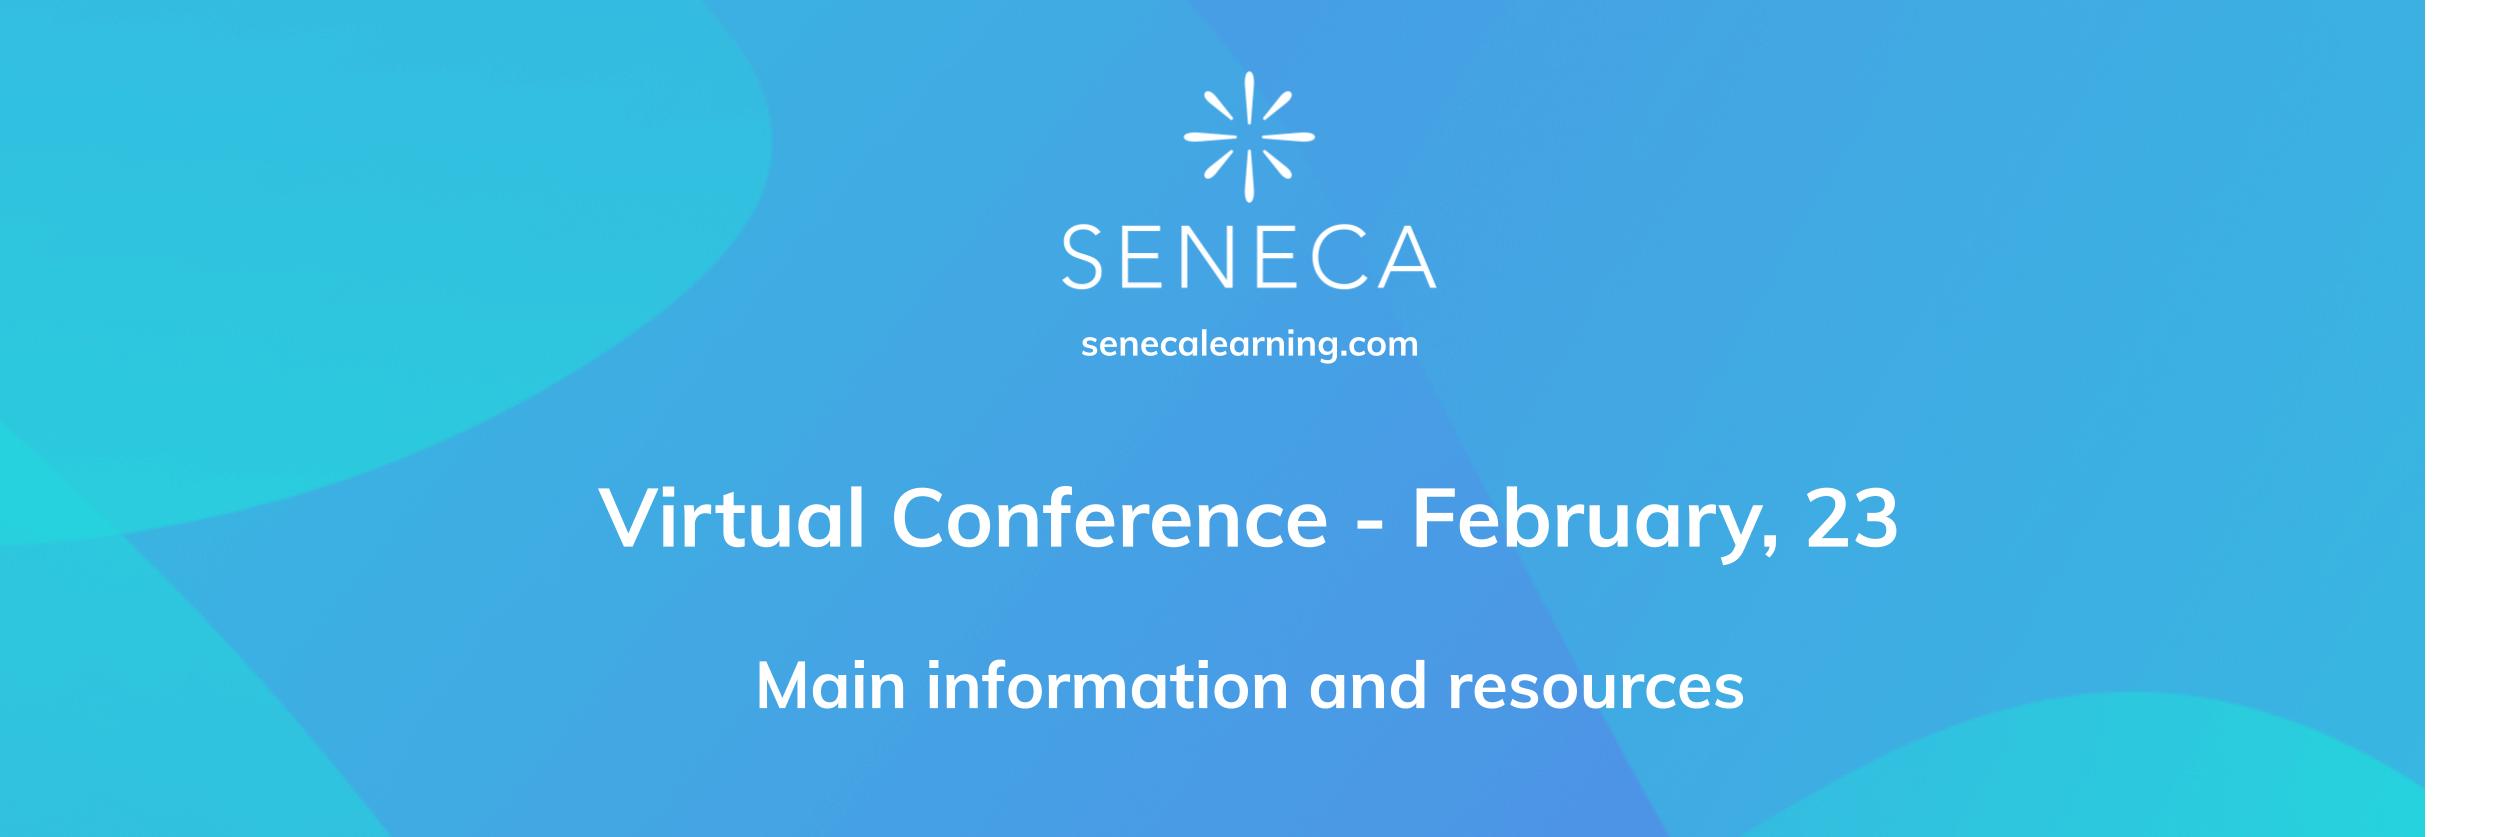 Seneca Virtual Teaching Conference